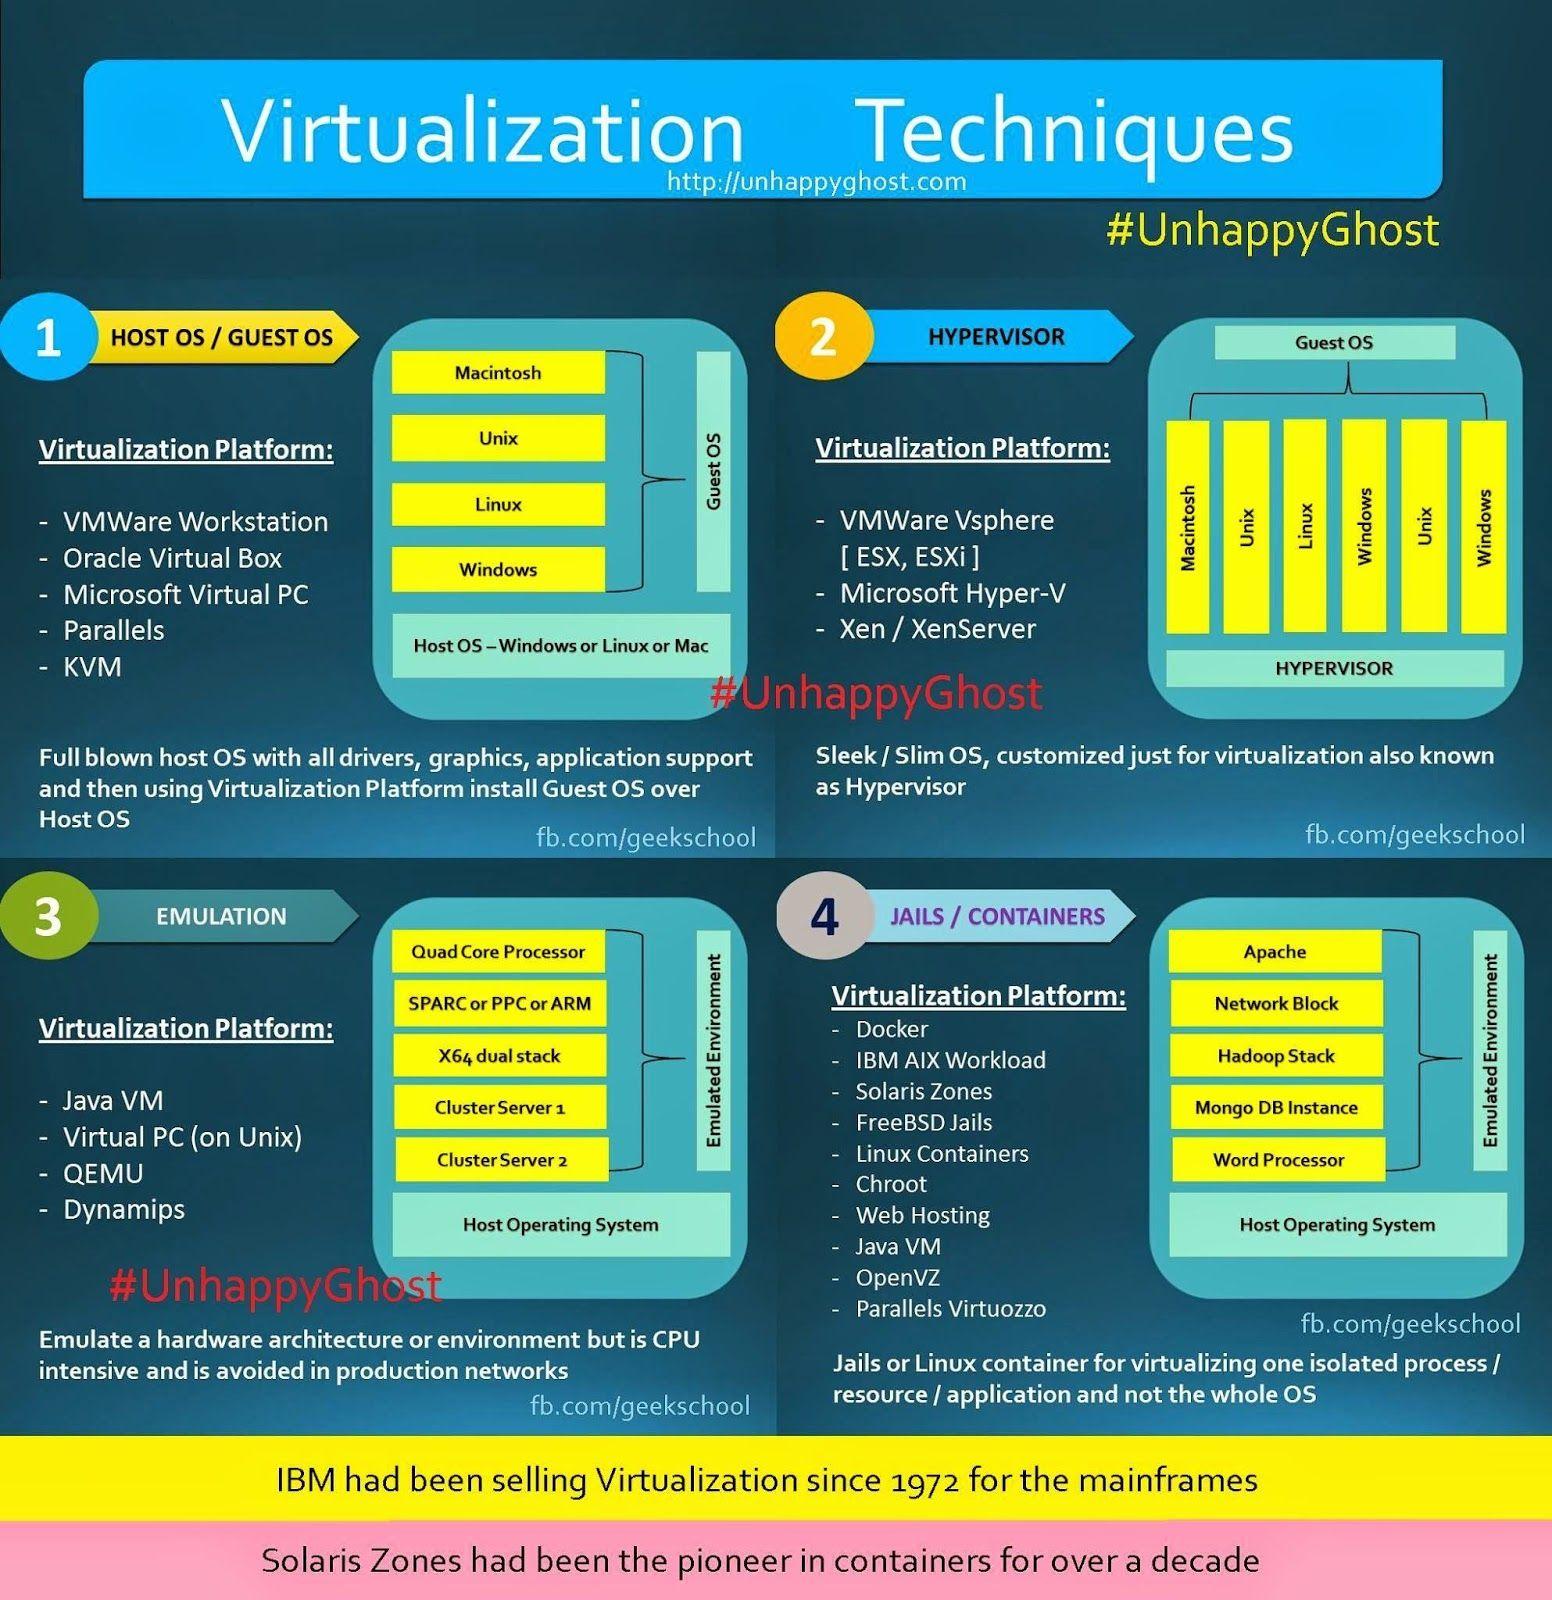 virtualizationhypervisoremulatorjailscontainers